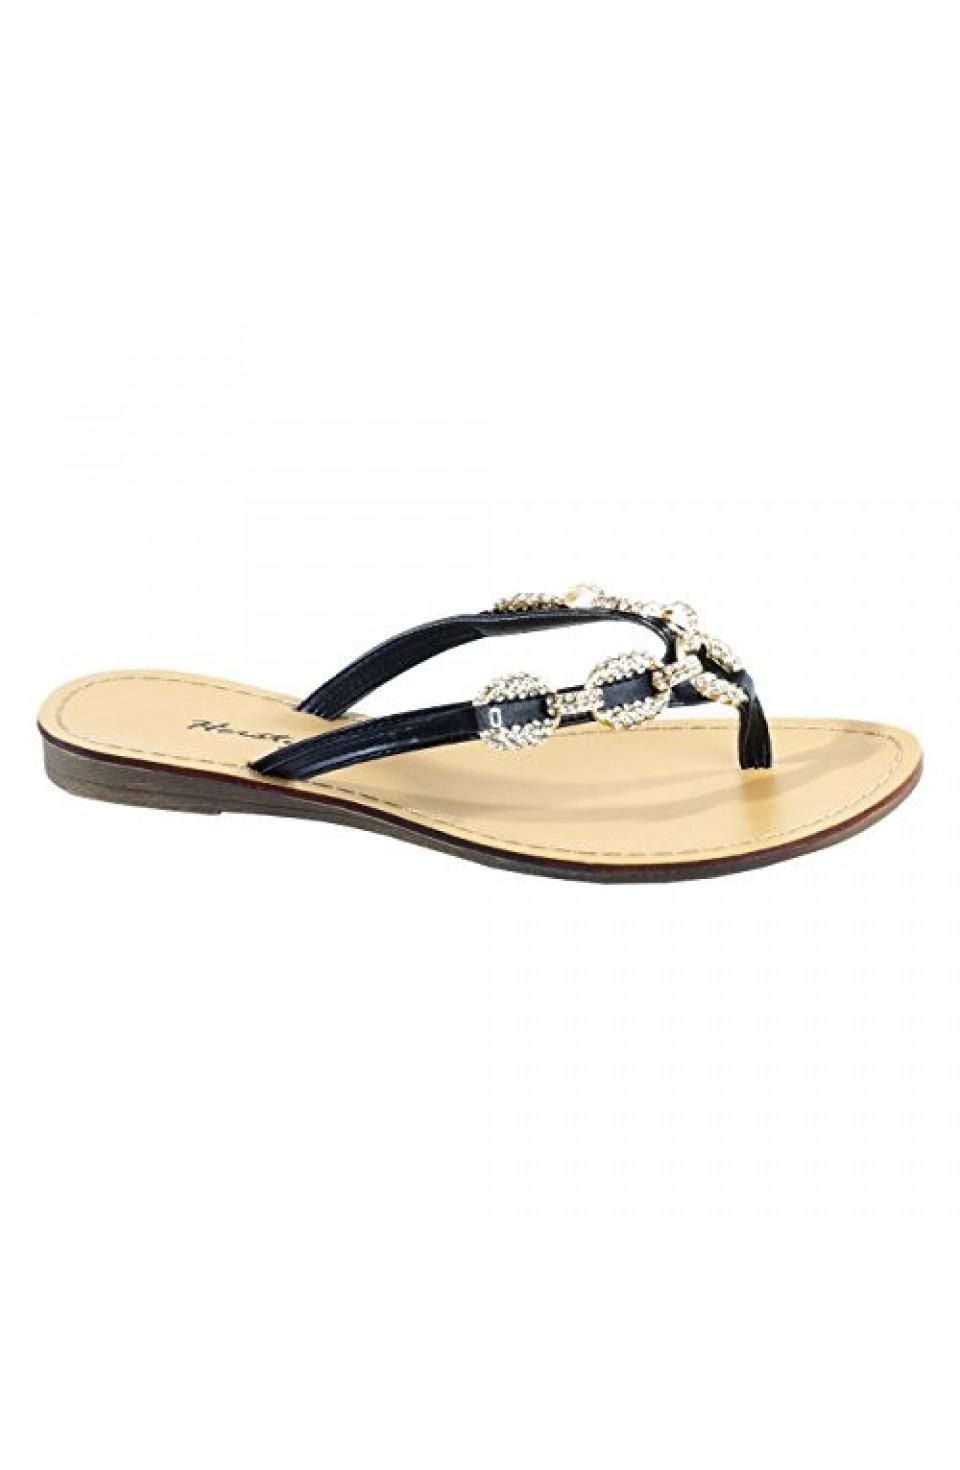 Women's Black Janiesa Manmade Flat Thong Sandal with Glowing Jeweled Chain